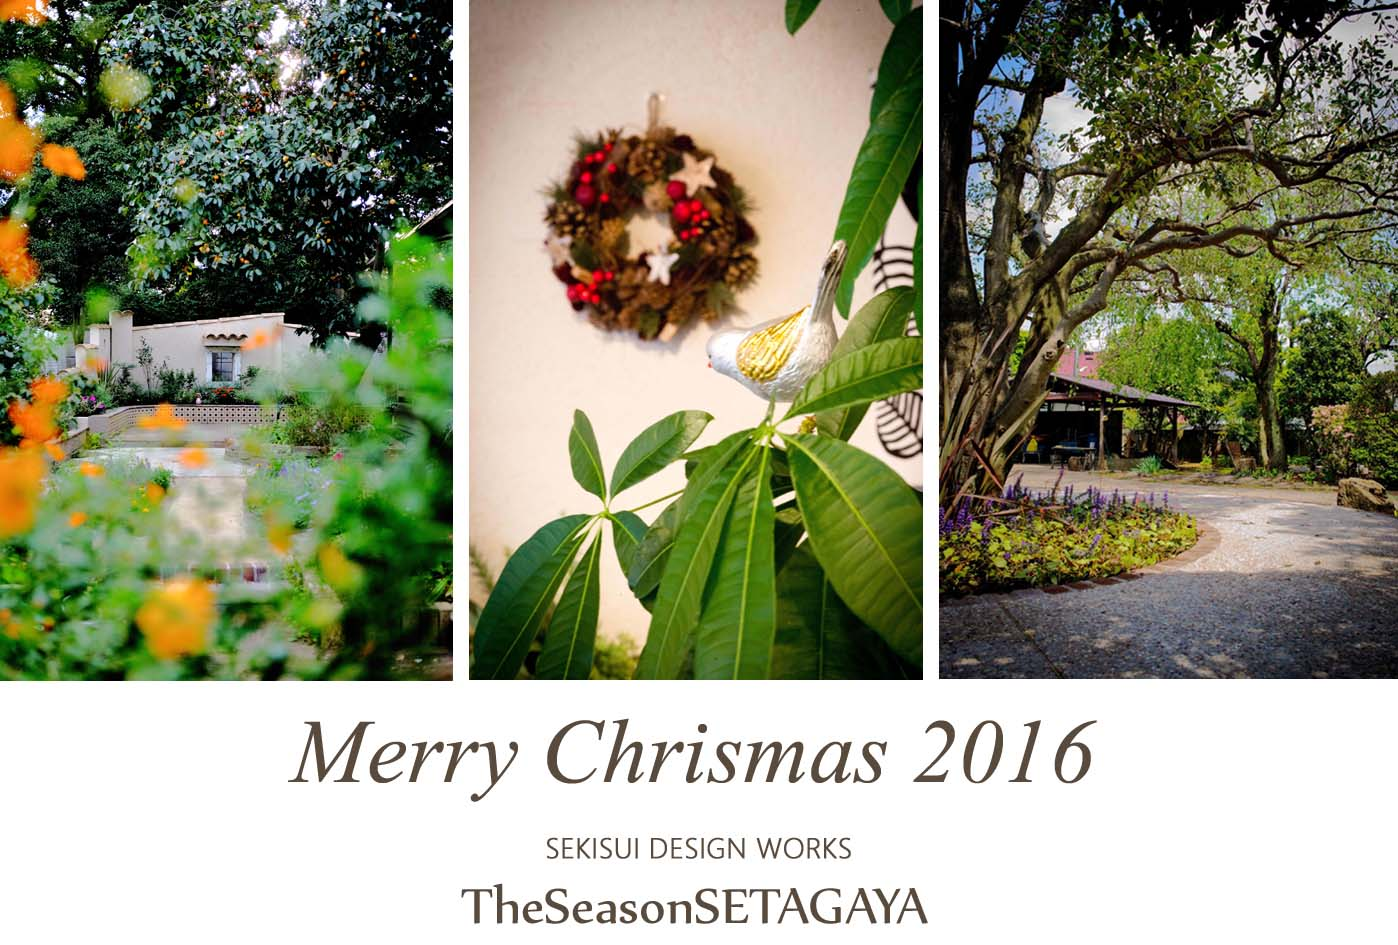 MerryChrismas2016 TheSeasonSETAGAYA